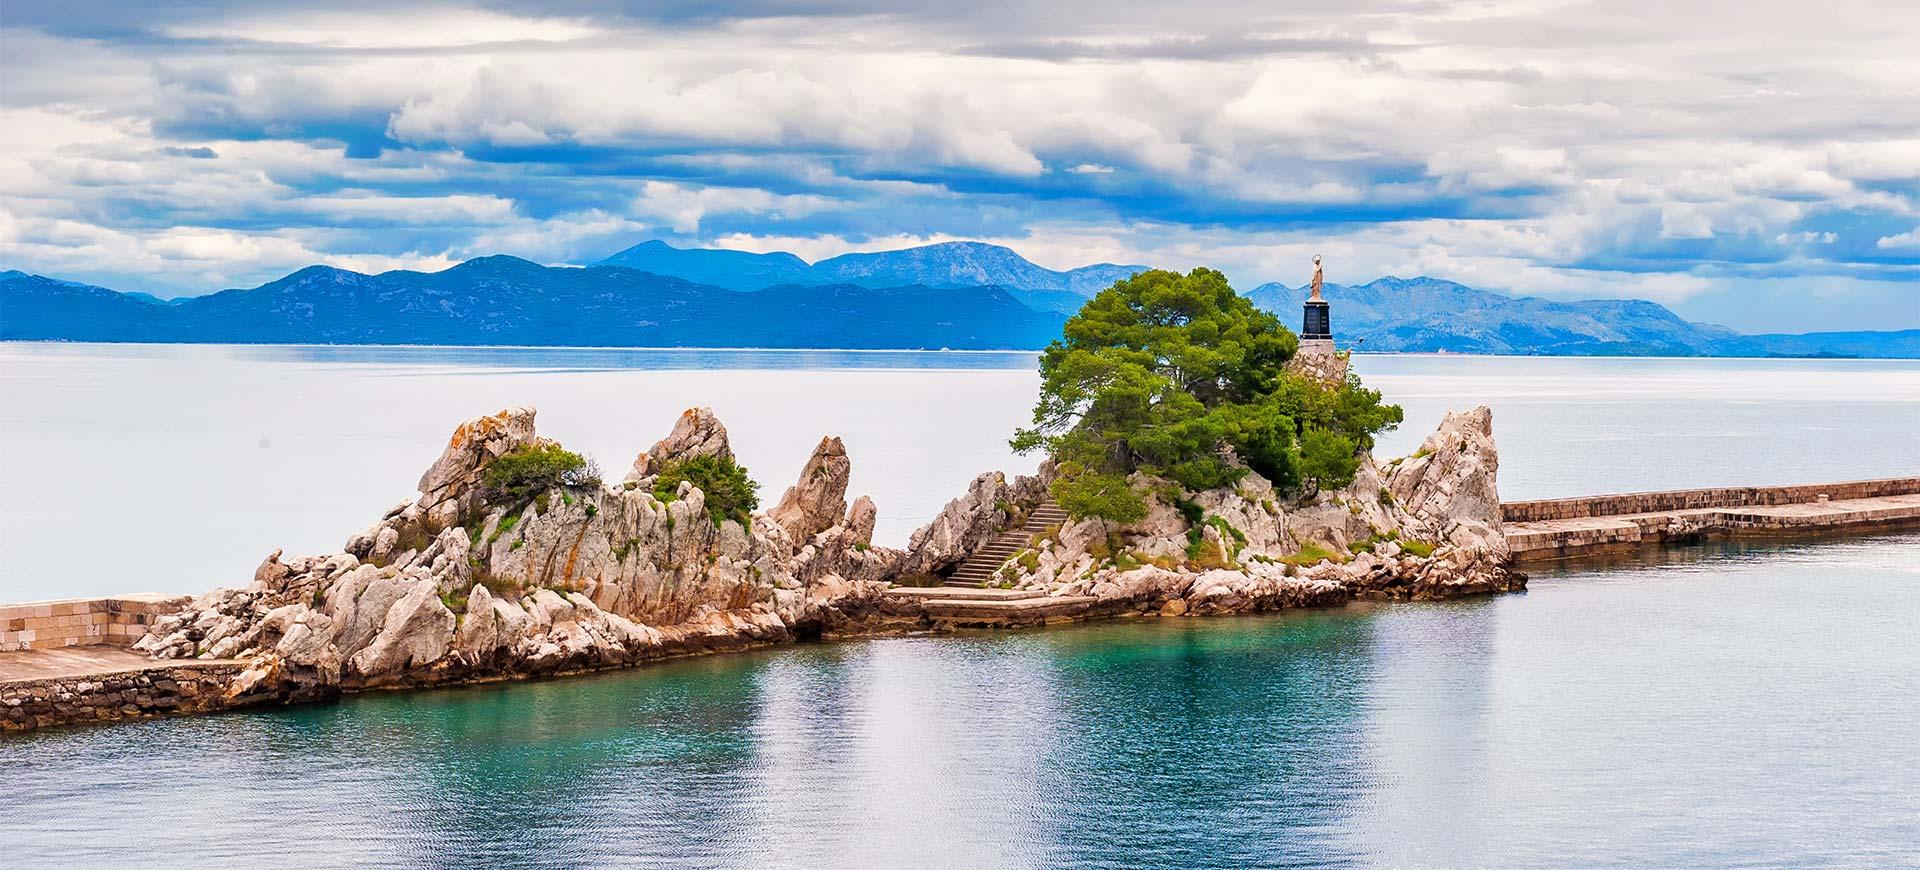 10 reasons why Croatia should be your next sailing destination